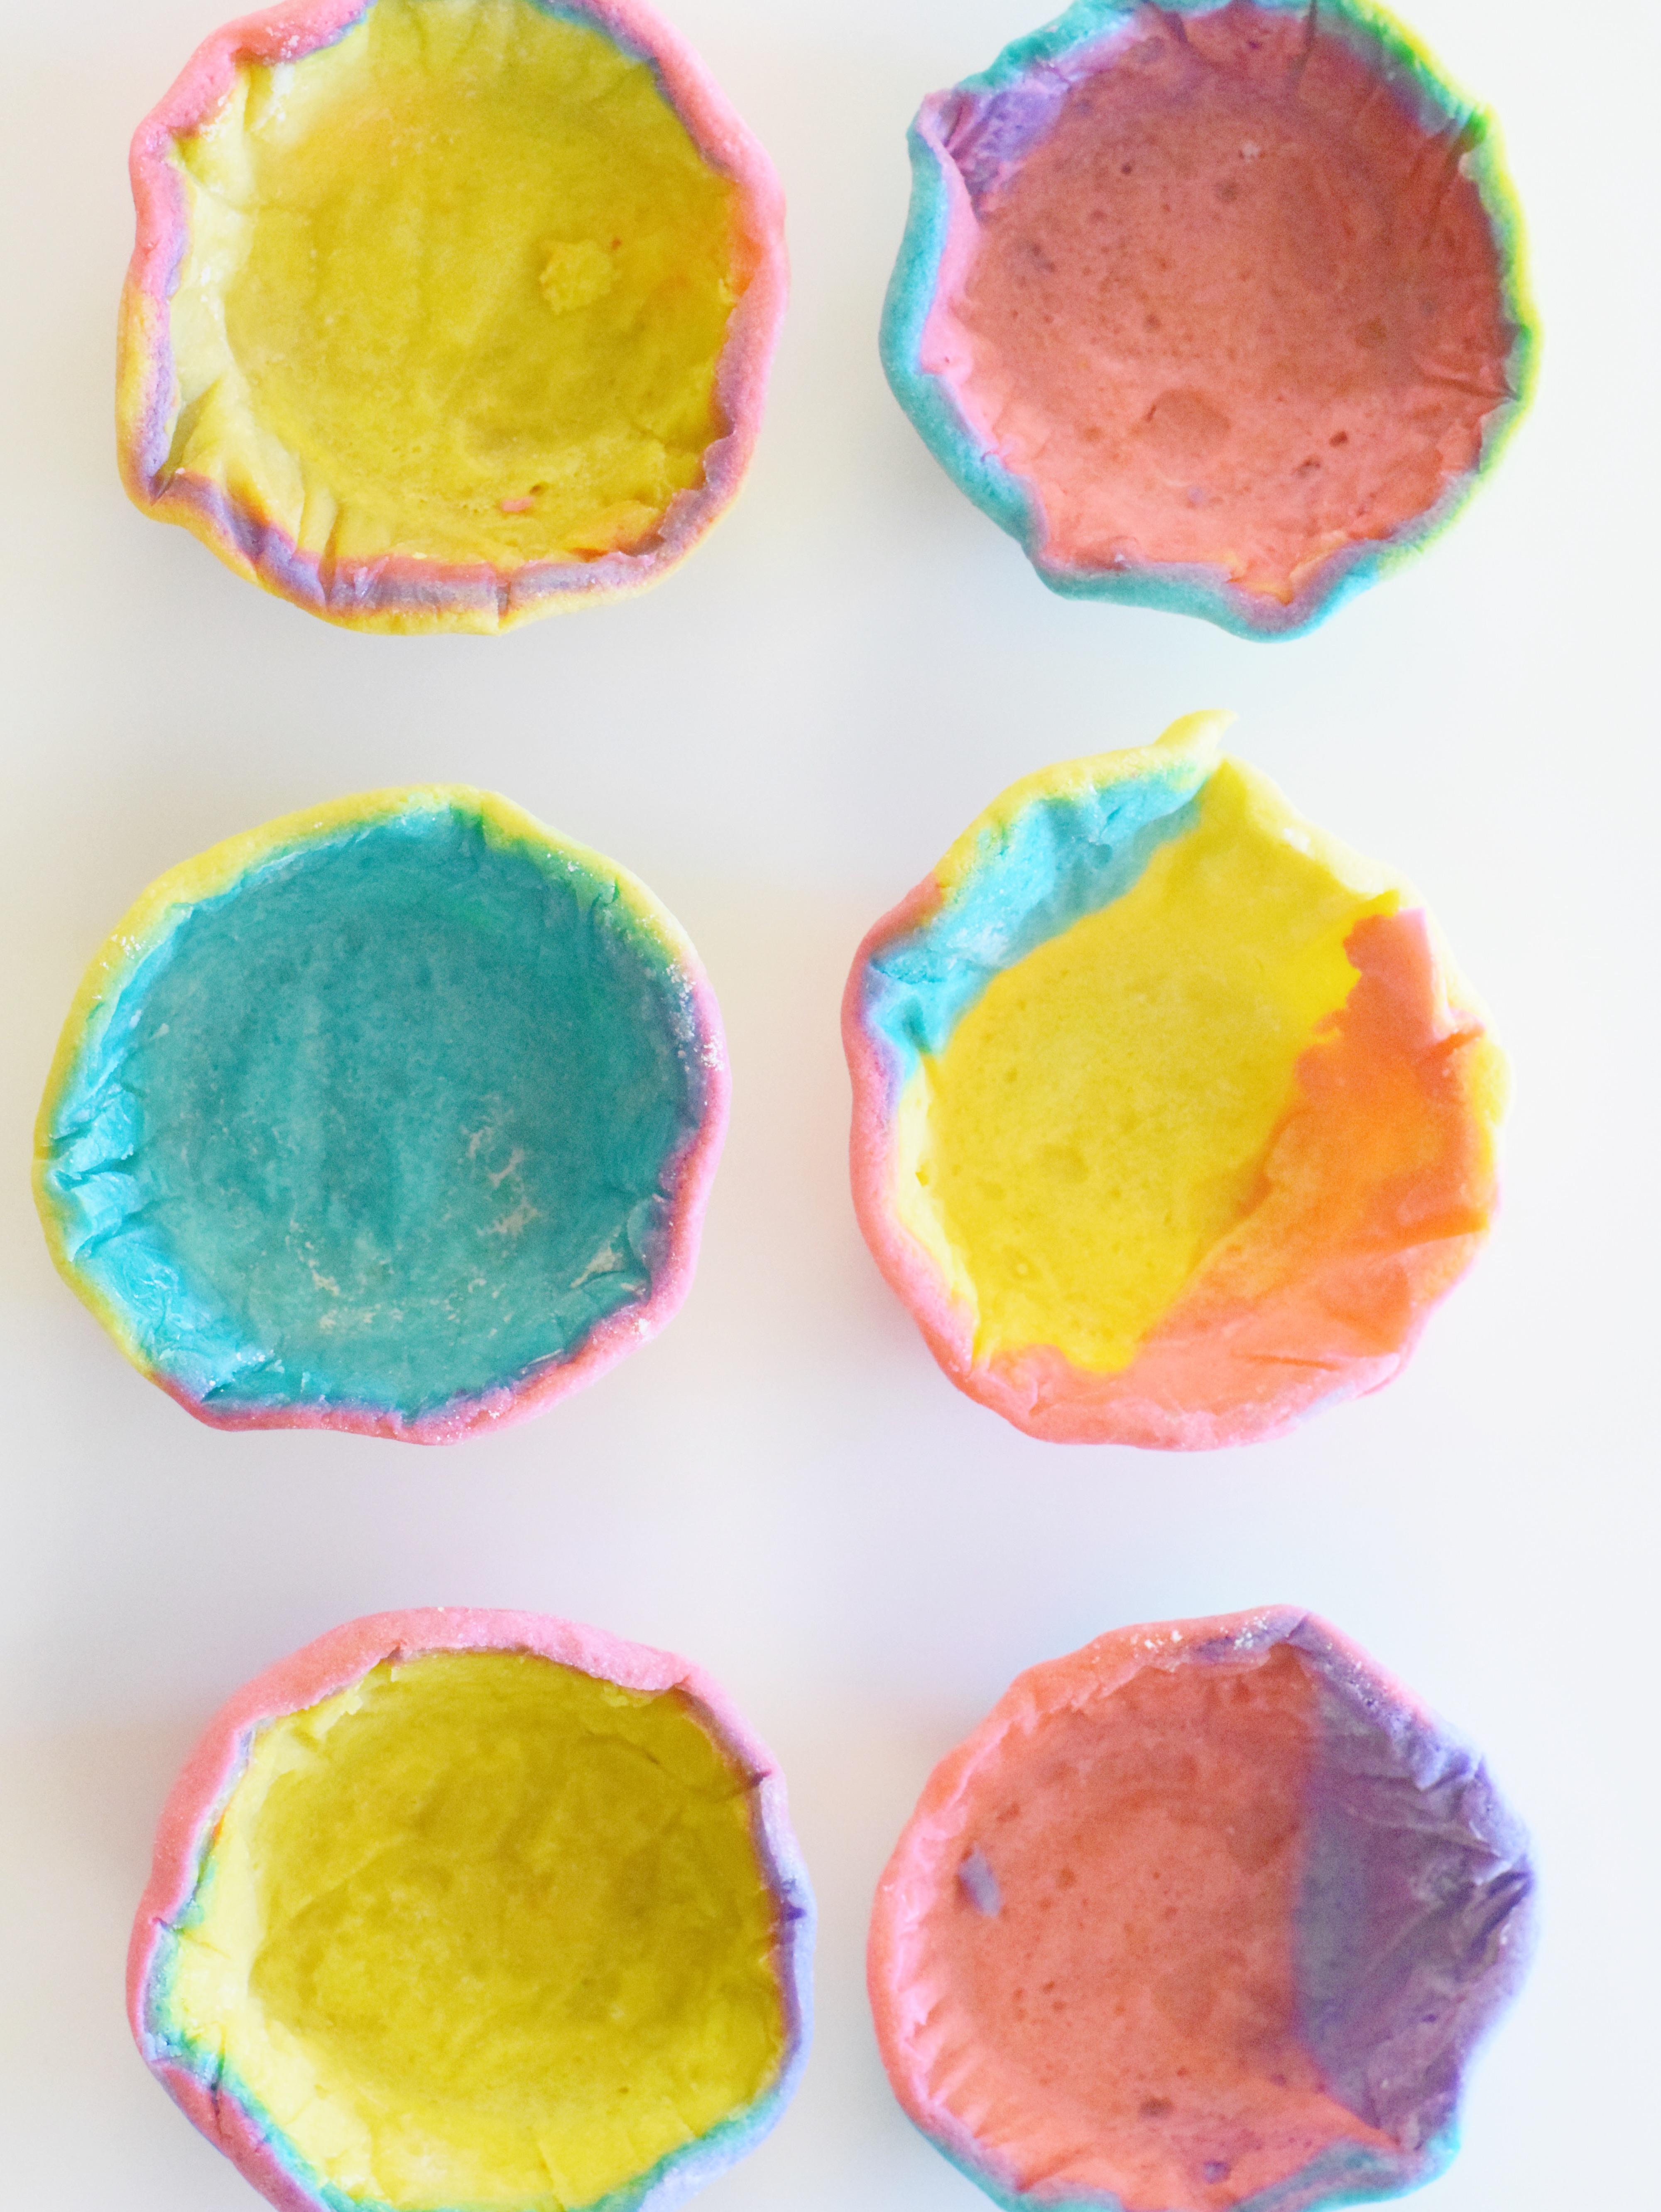 Rainbow Sugar Cookie Bowls - Rainbow Recipe - Cookie Dough Bowls - Easy Recipe For Kids - Dessert Ideas - Unicorn Party - Rainbow Dessert - Recipe - Communikait by Kait Hanson